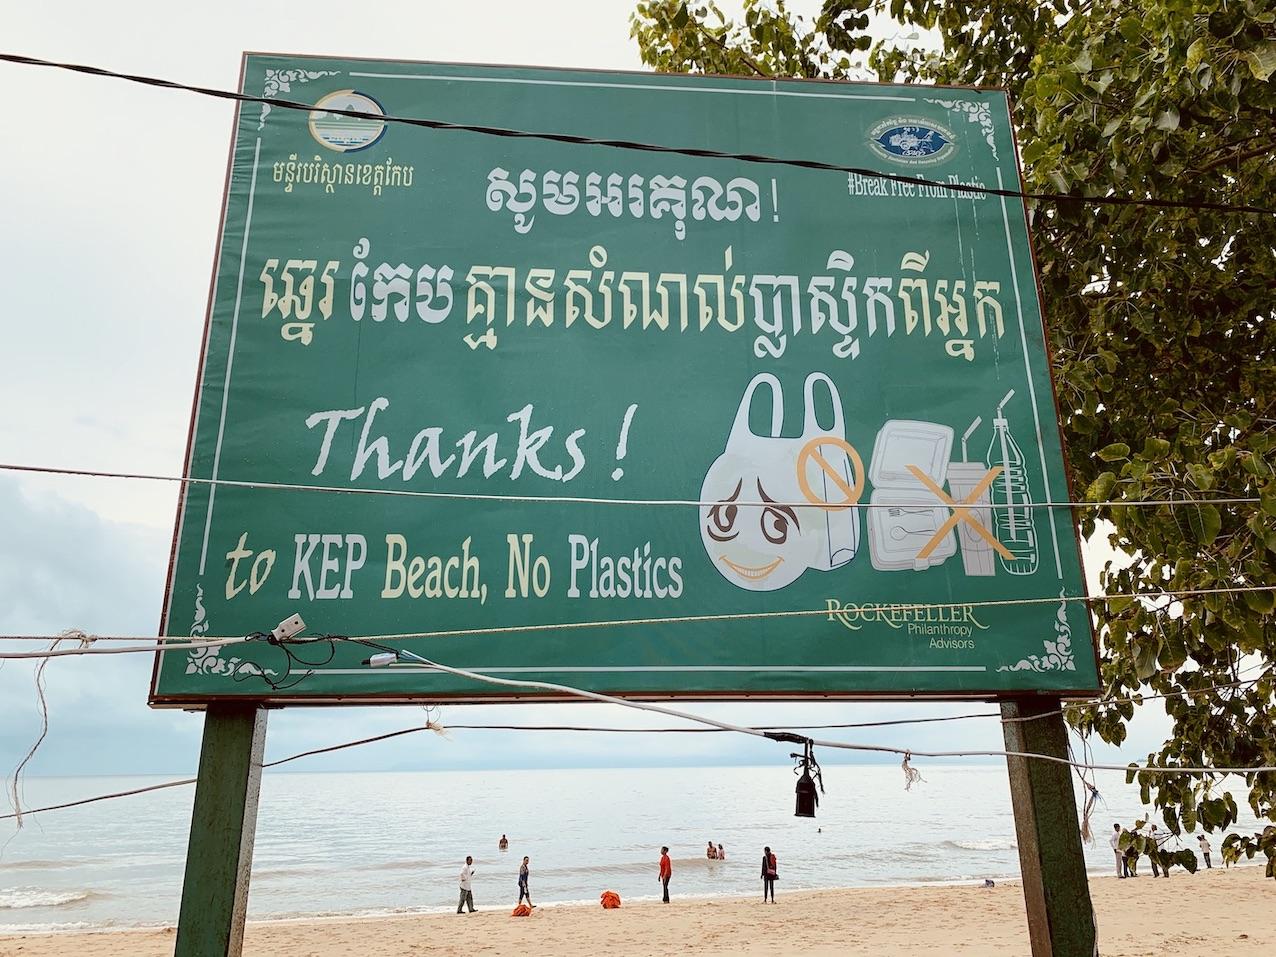 No plastics! Kep Beach.